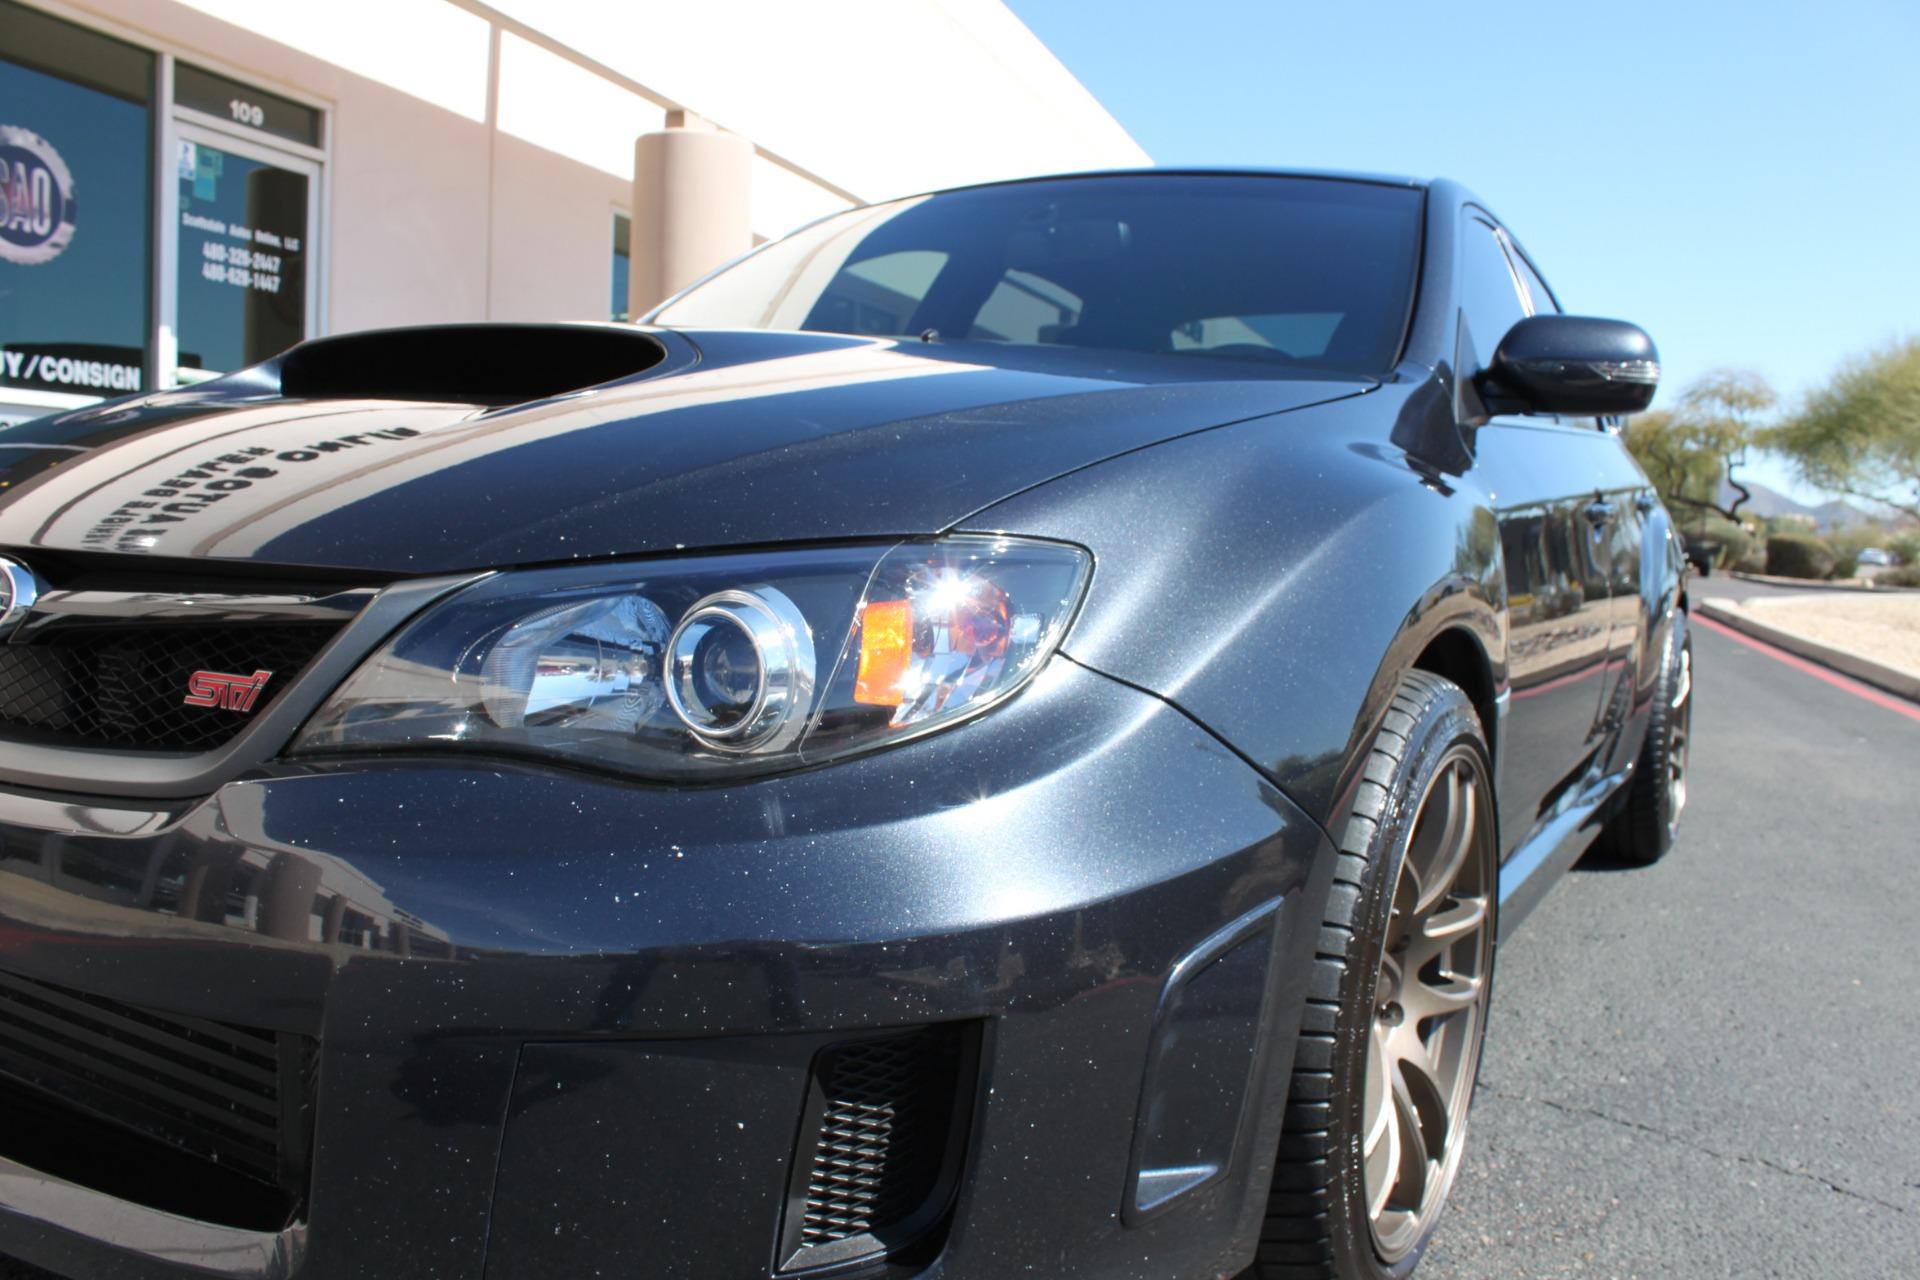 Used-2011-Subaru-Impreza-Sedan-WRX-STI-Lexus